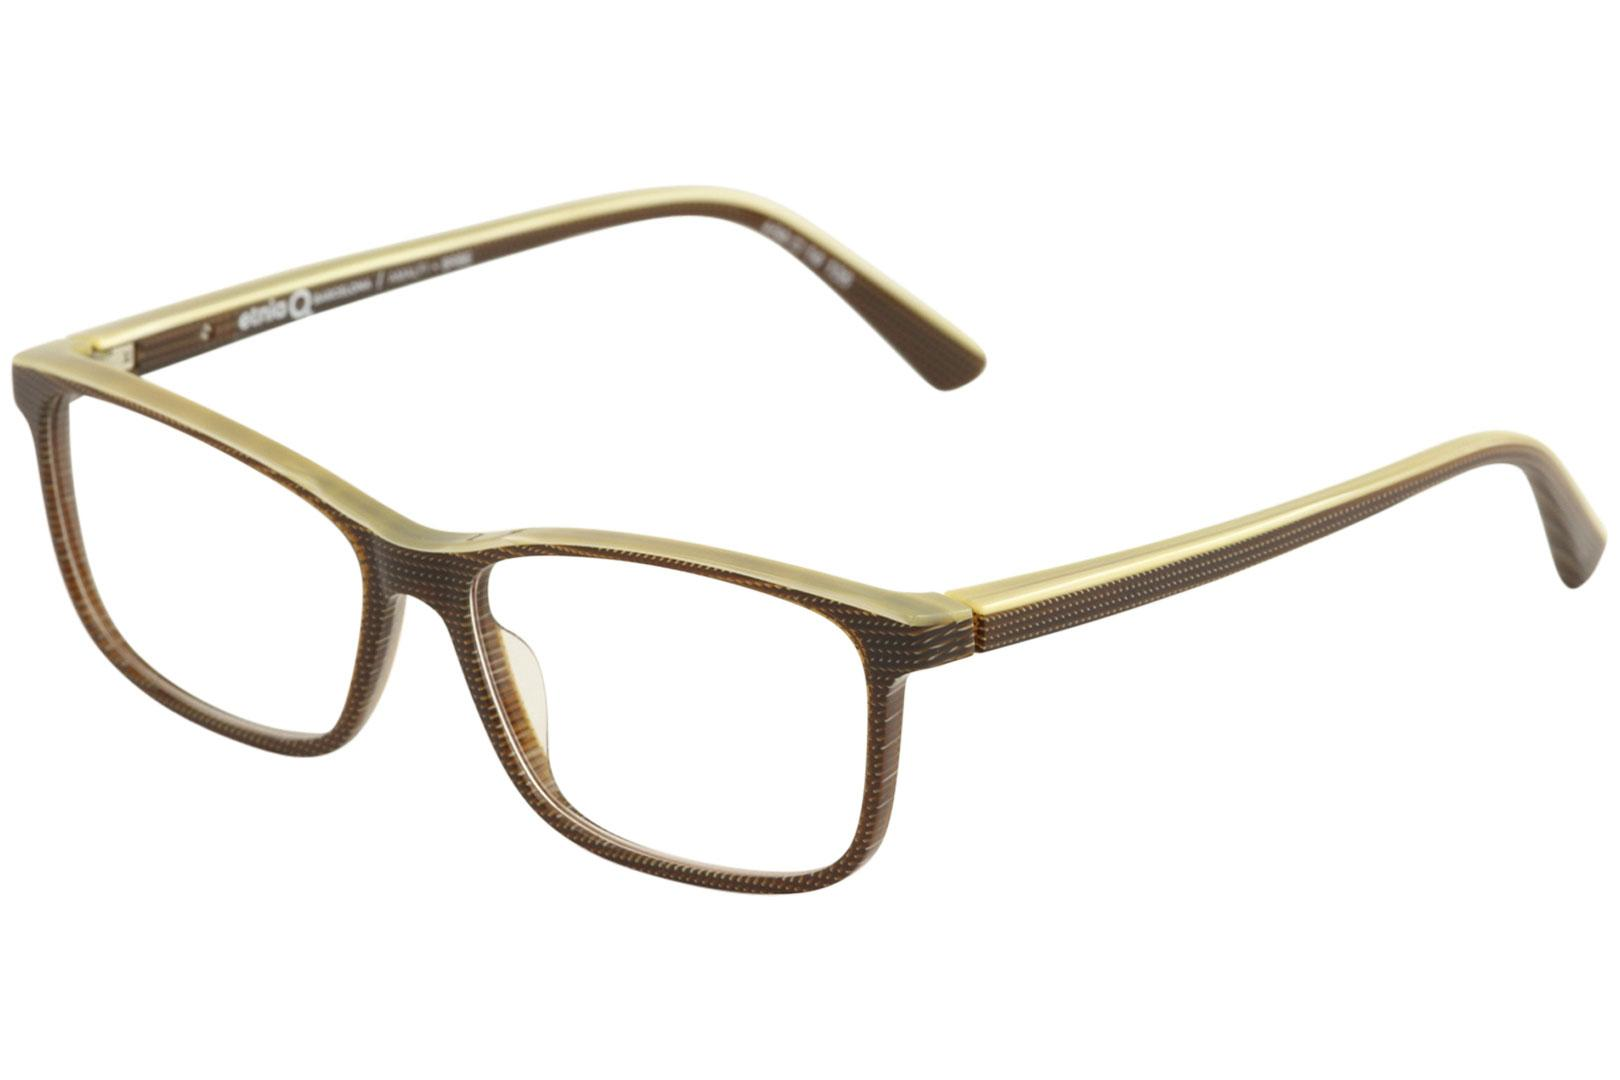 621ff9de66a Etnia Barcelona Women s Eyeglasses Amalfi Full Rim Optical Frame